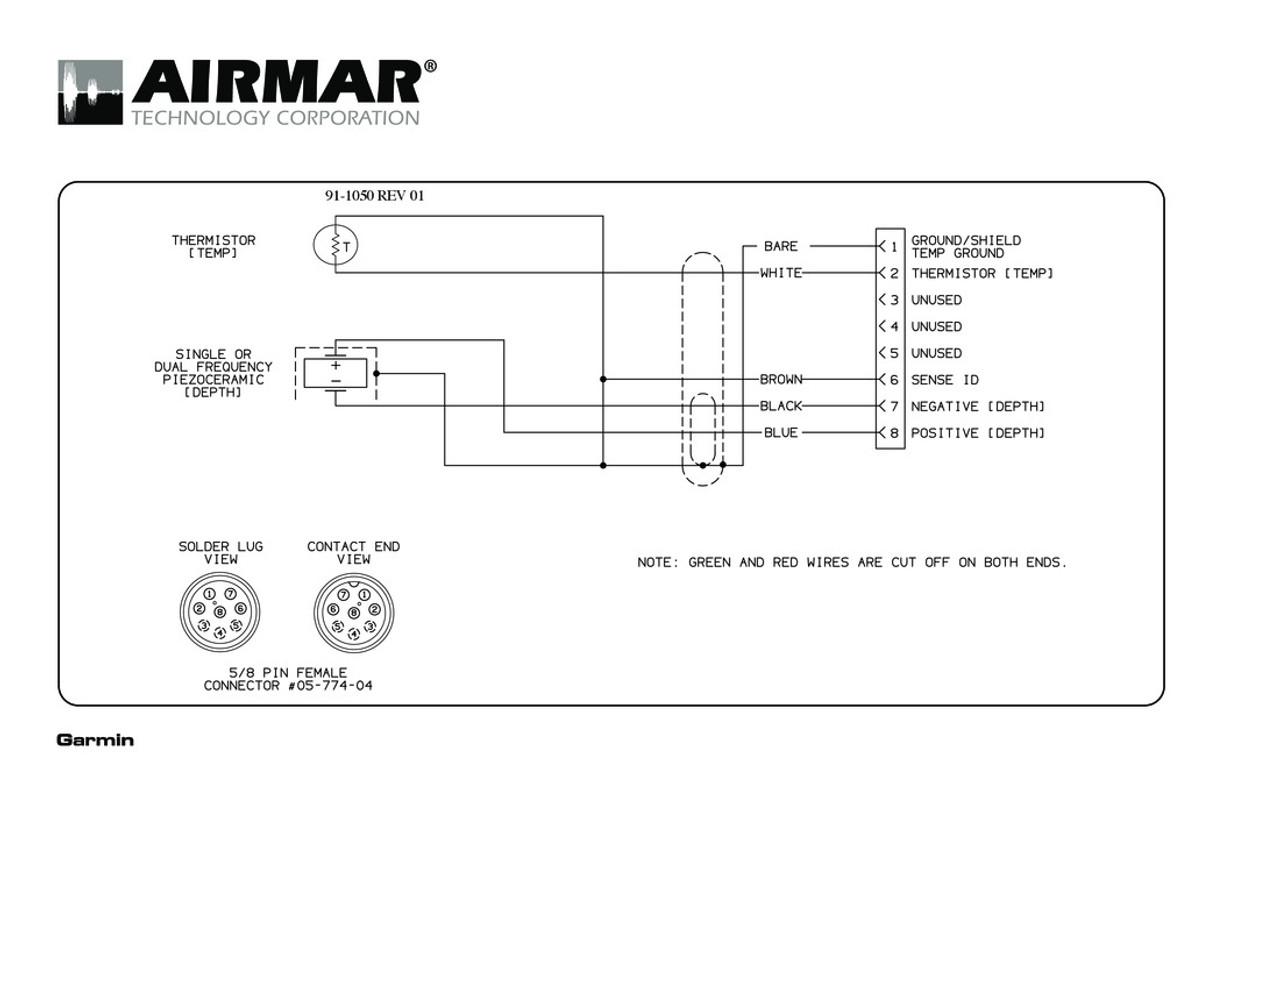 Airmar Wiring Diagrams 4 Way Switch Diagram Red White Black Garmin P319 8 Pin D T Blue Bottle Marine Rh Bluebottlemarine Com 3 Symbols